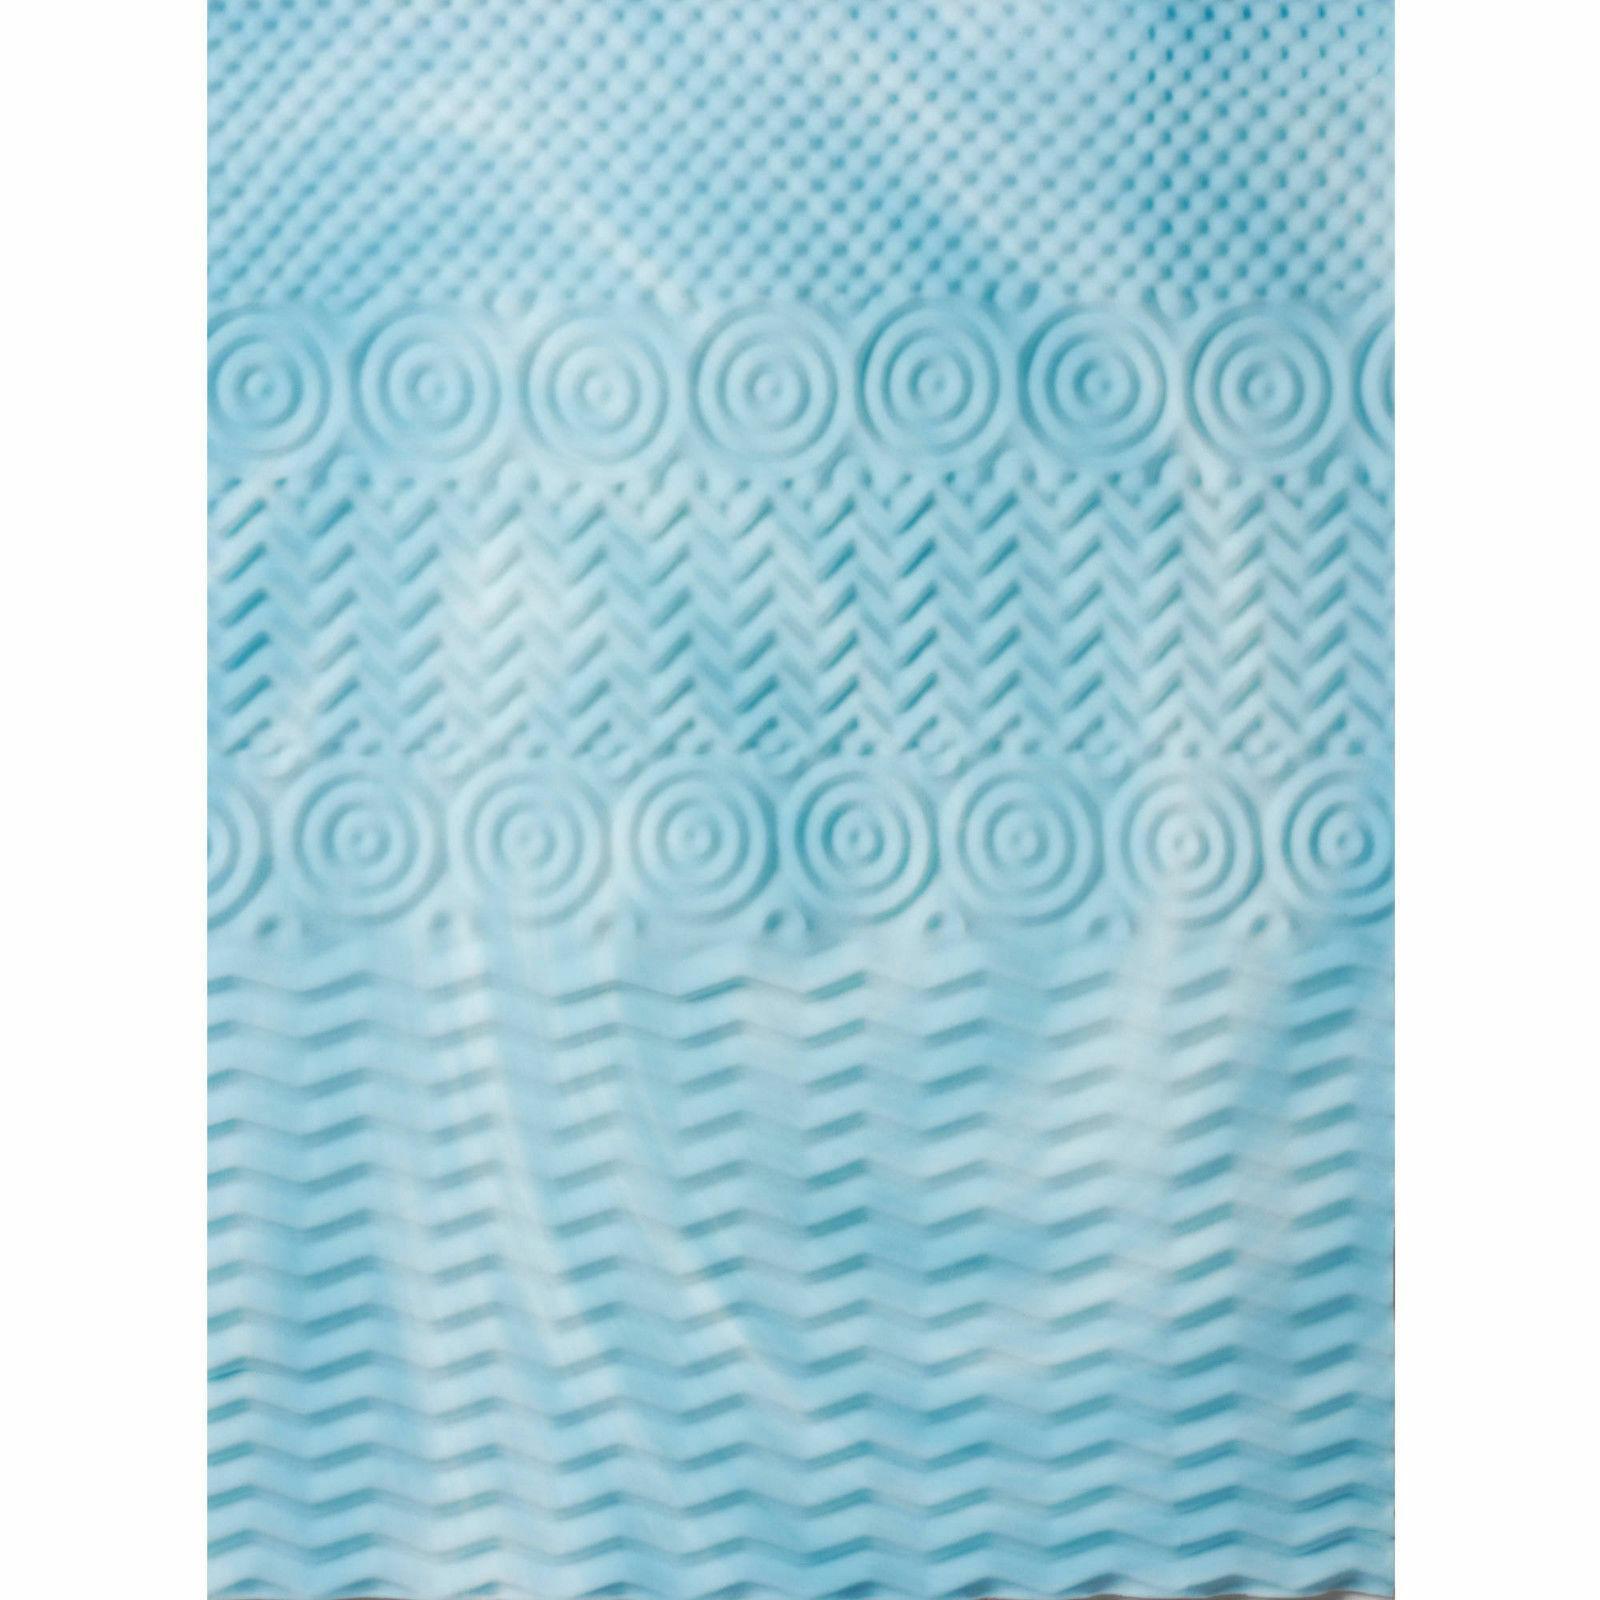 2 Inch Cooling Gel Foam Mattress Bed Cushion Zone Orthopedic